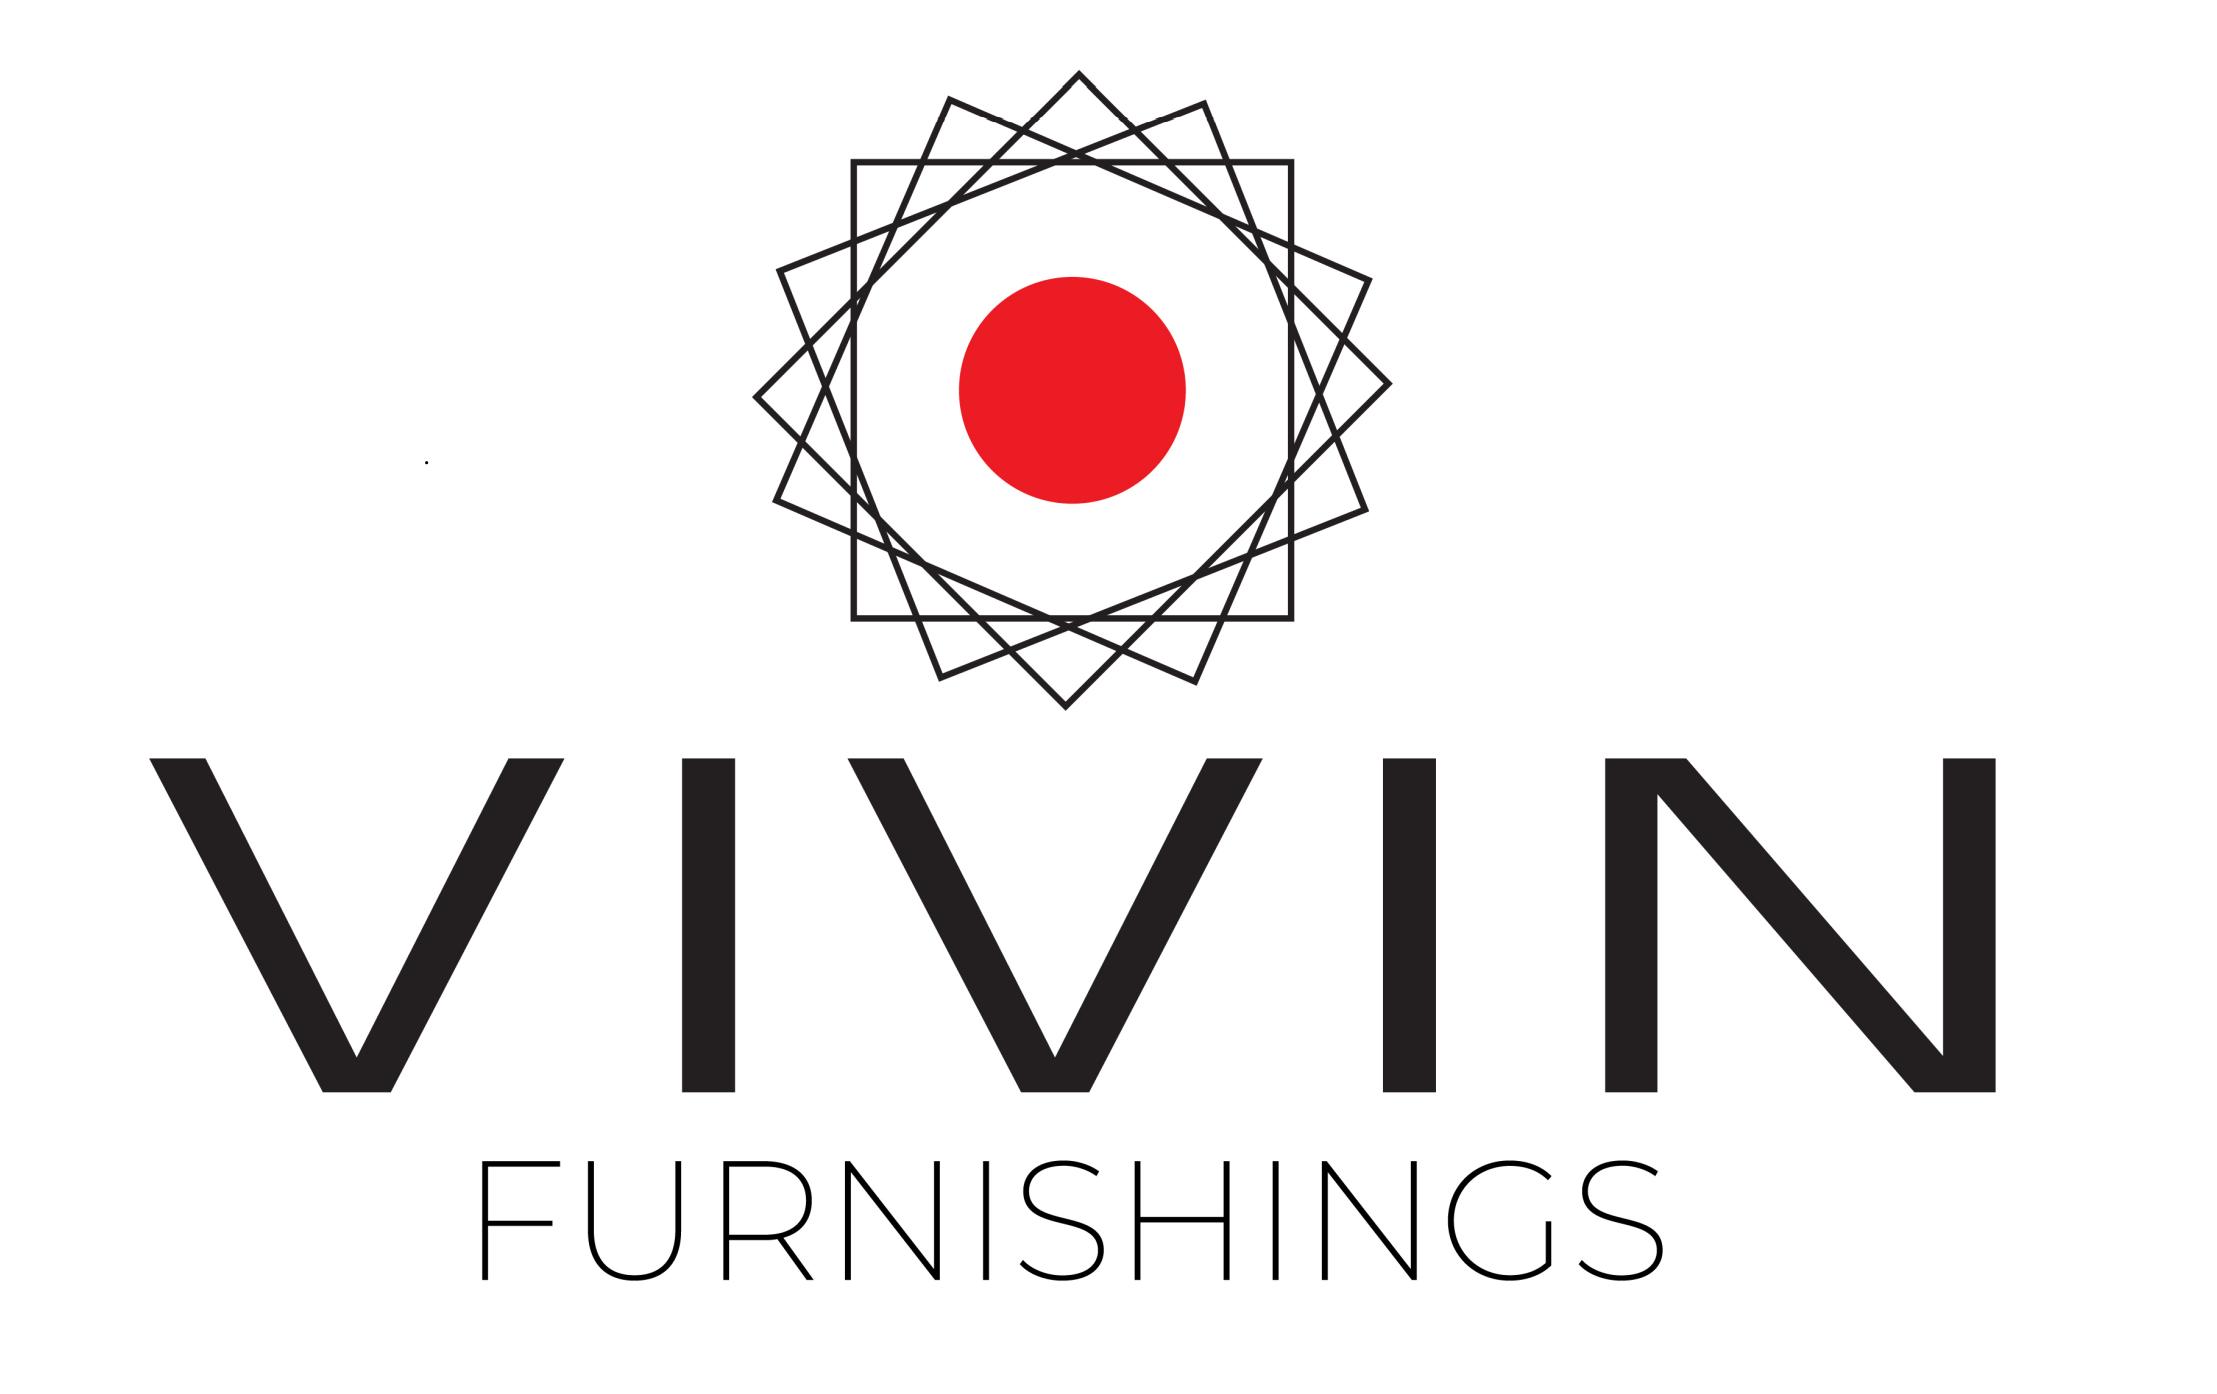 Vivin Furnishings